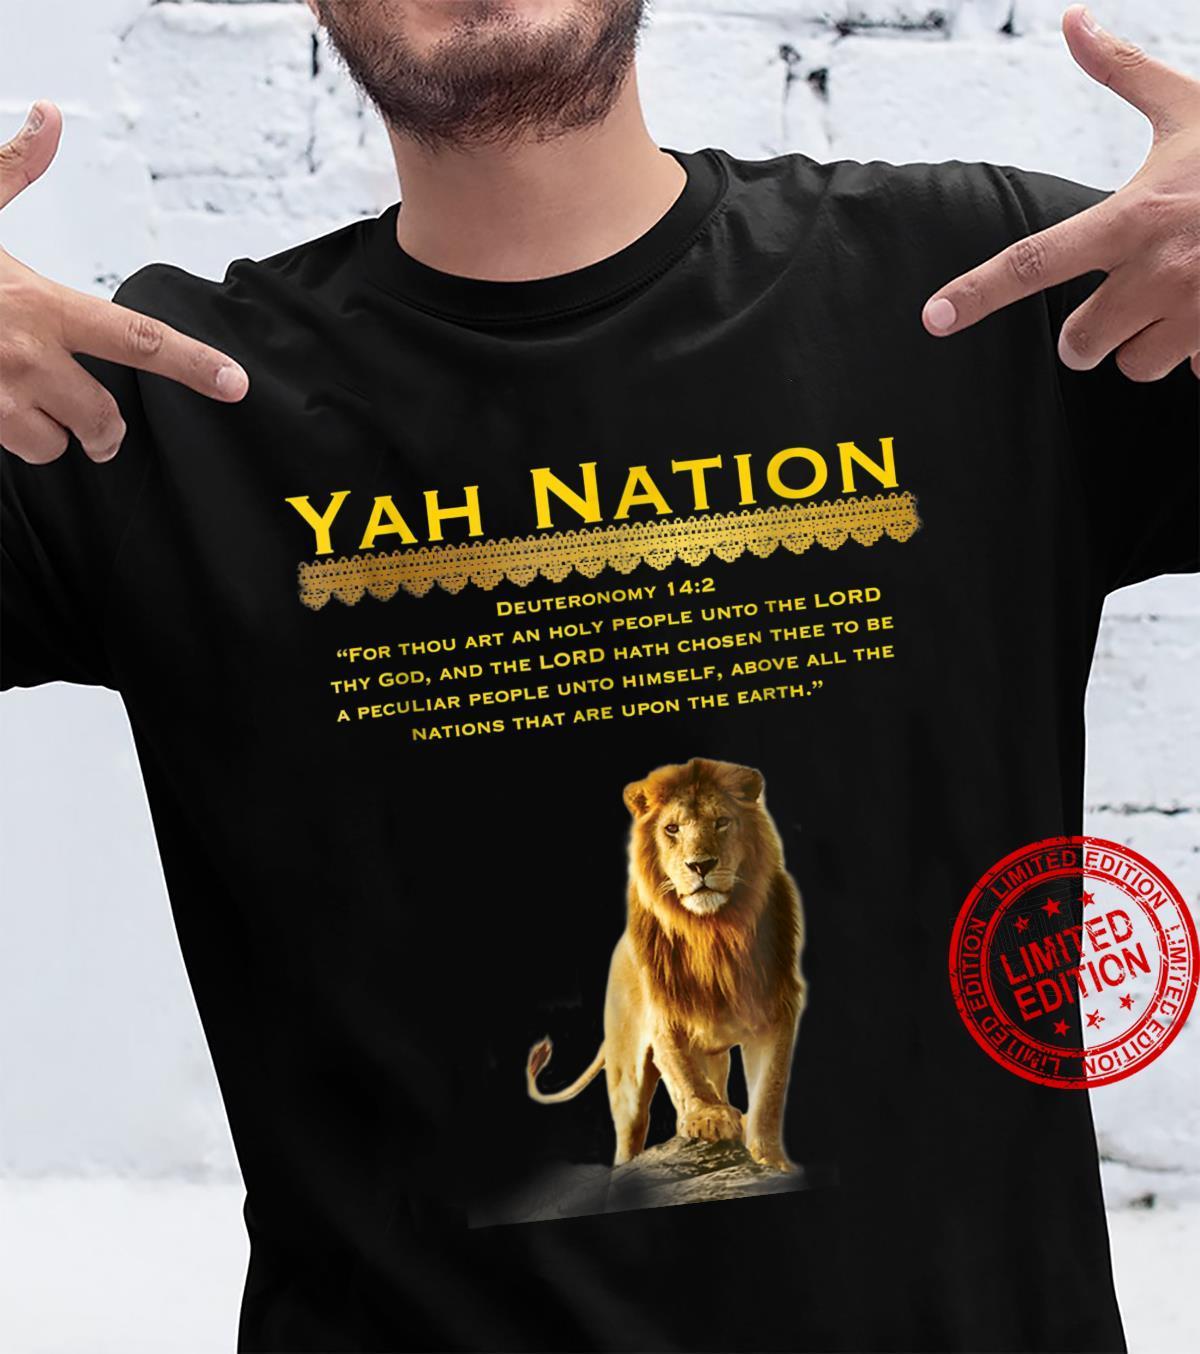 TRUTHFULL GARMENTS Yah Nation God Chosen Bible Shirt